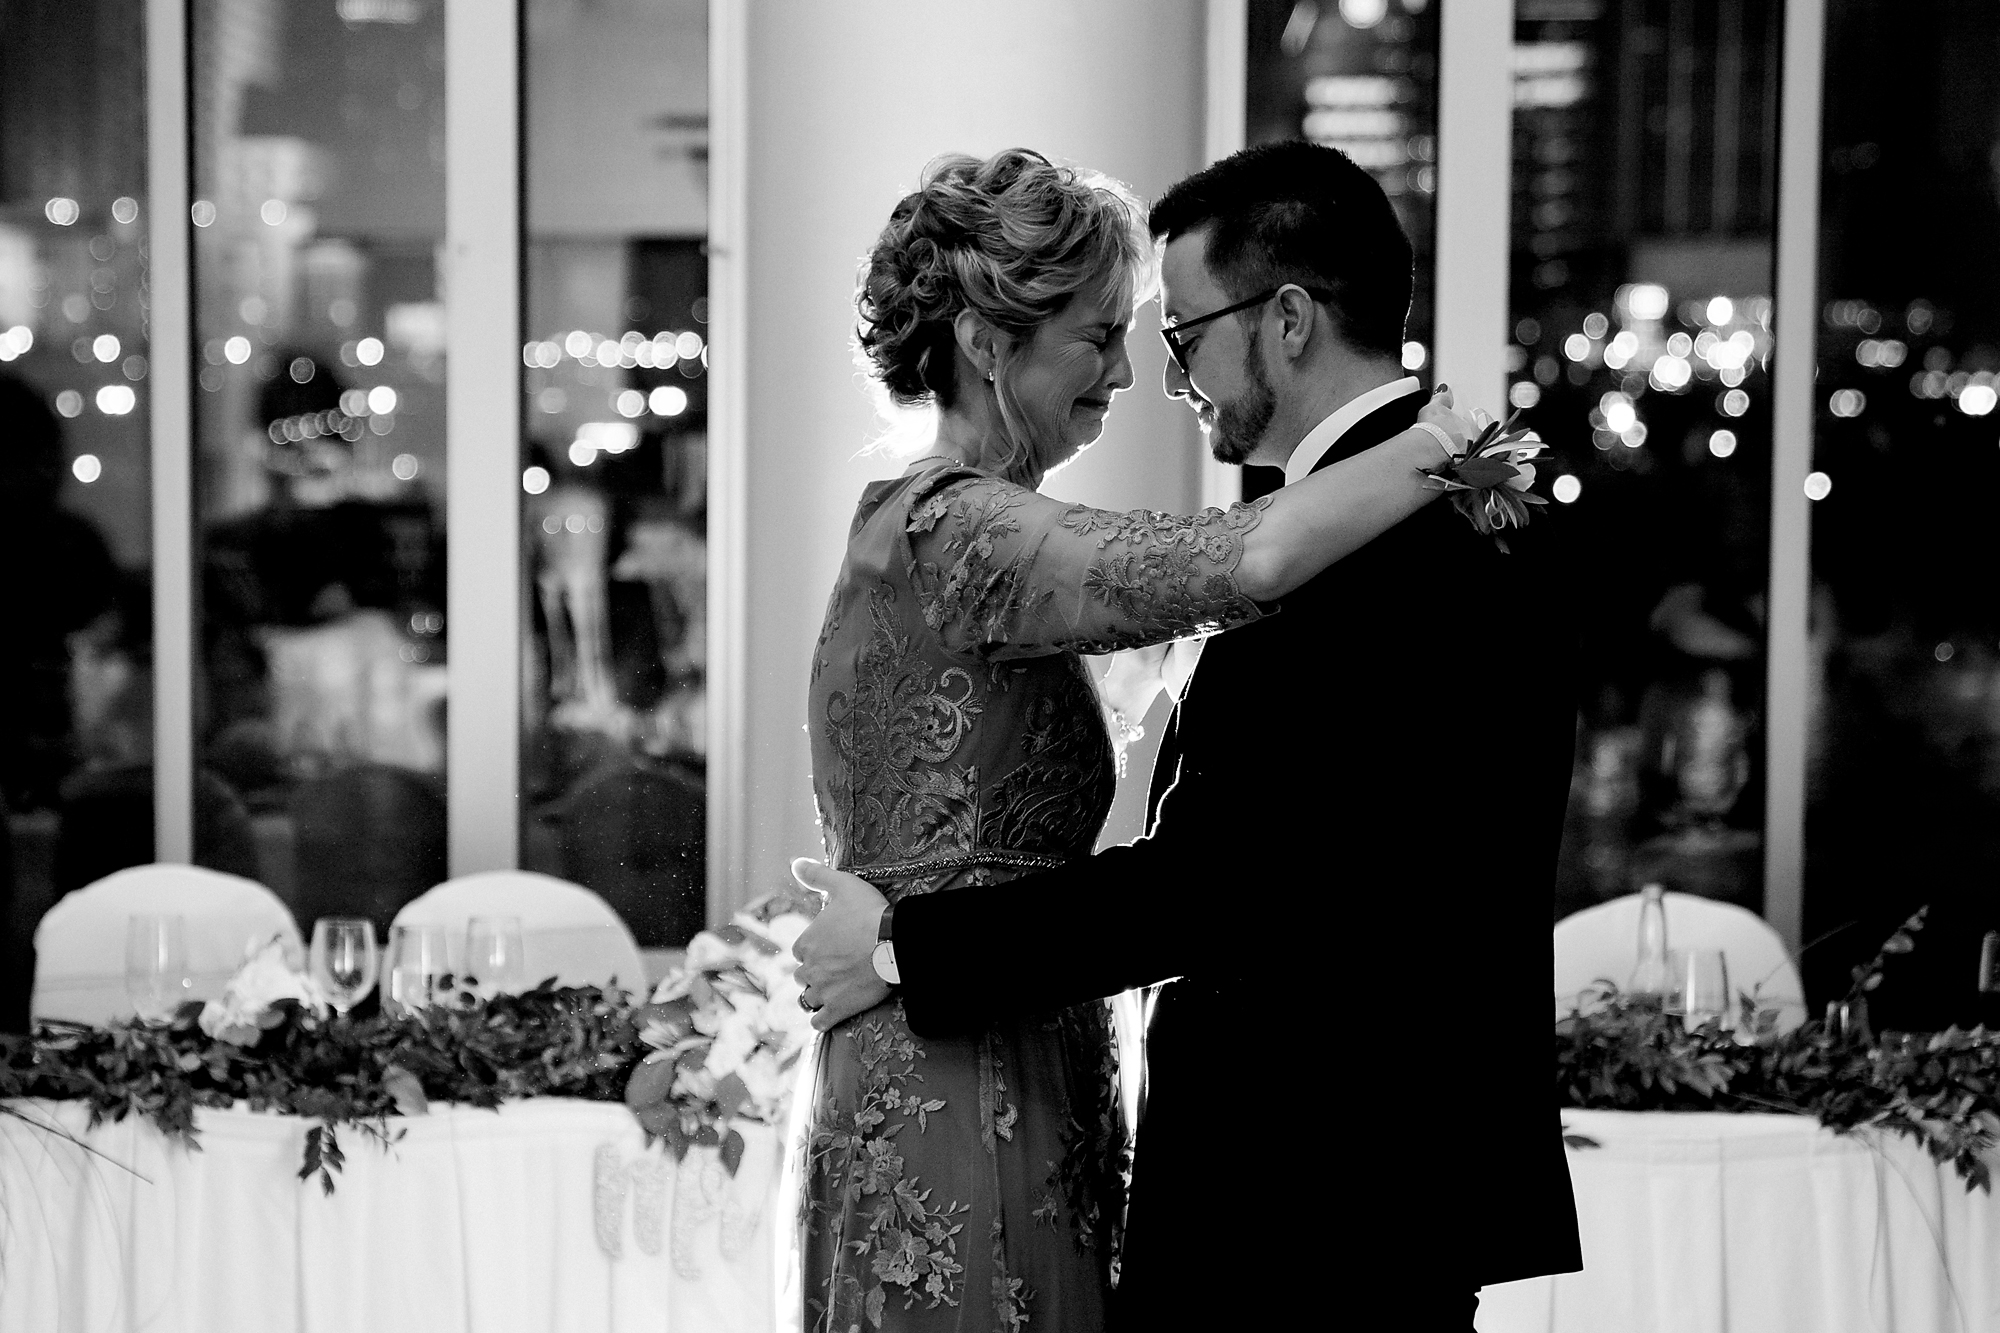 Embassy-Suites-Rivercenter-Wedding-Photography-37.jpg